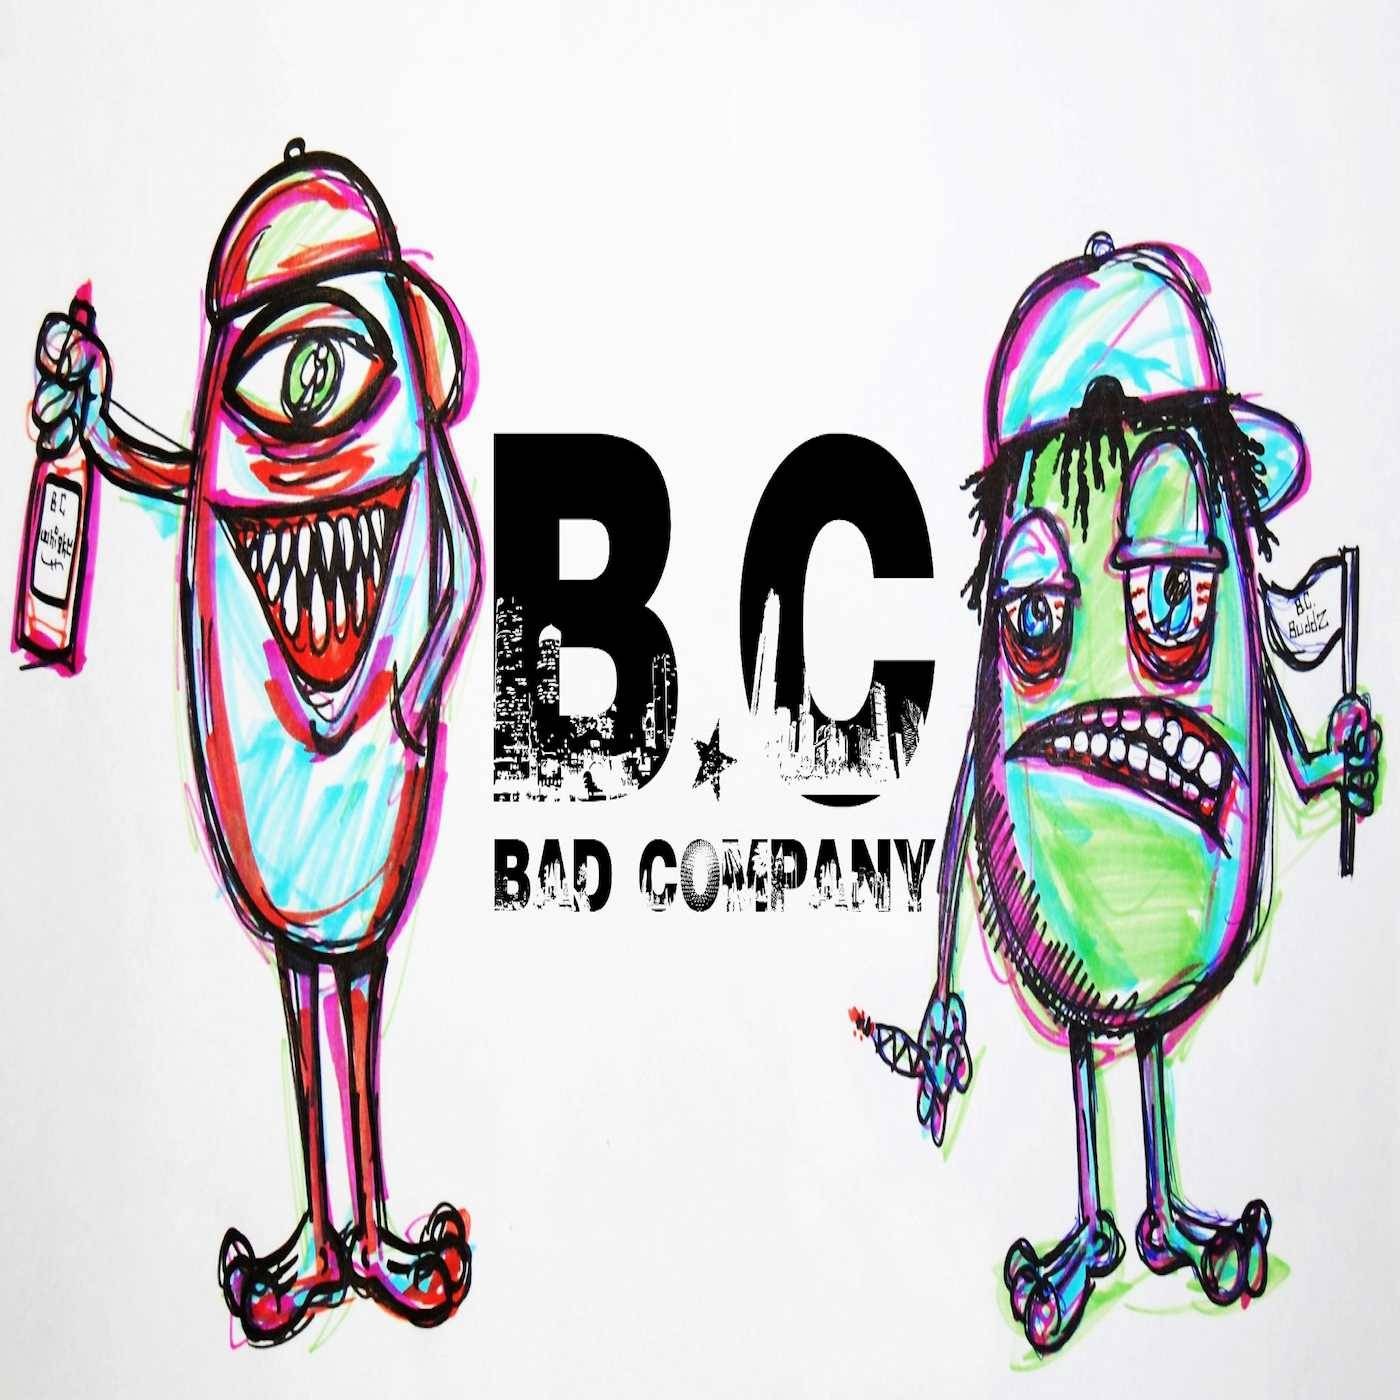 Bcbuddz Live show art